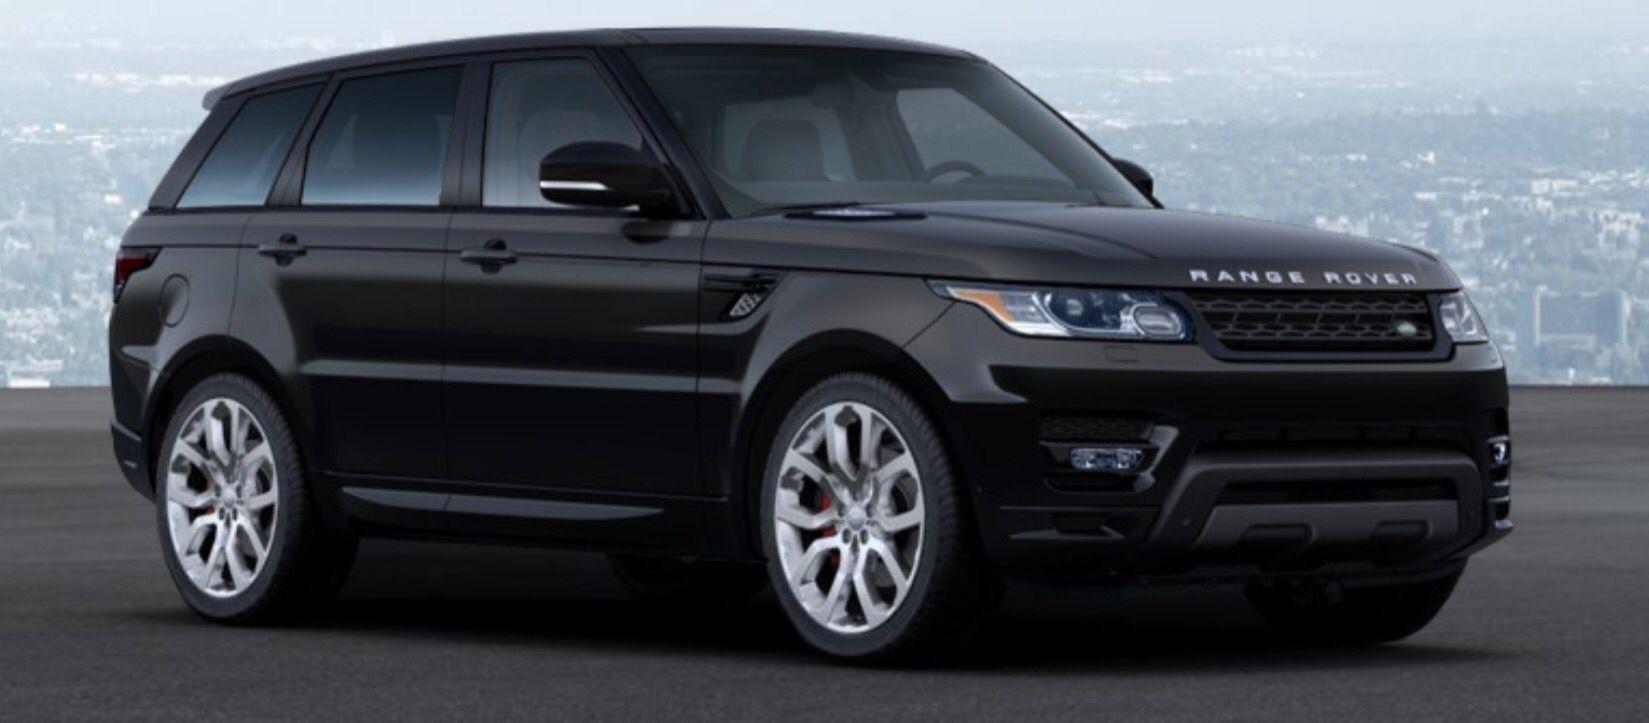 2016 Range Rover Sport Autobiography Range rover, Range